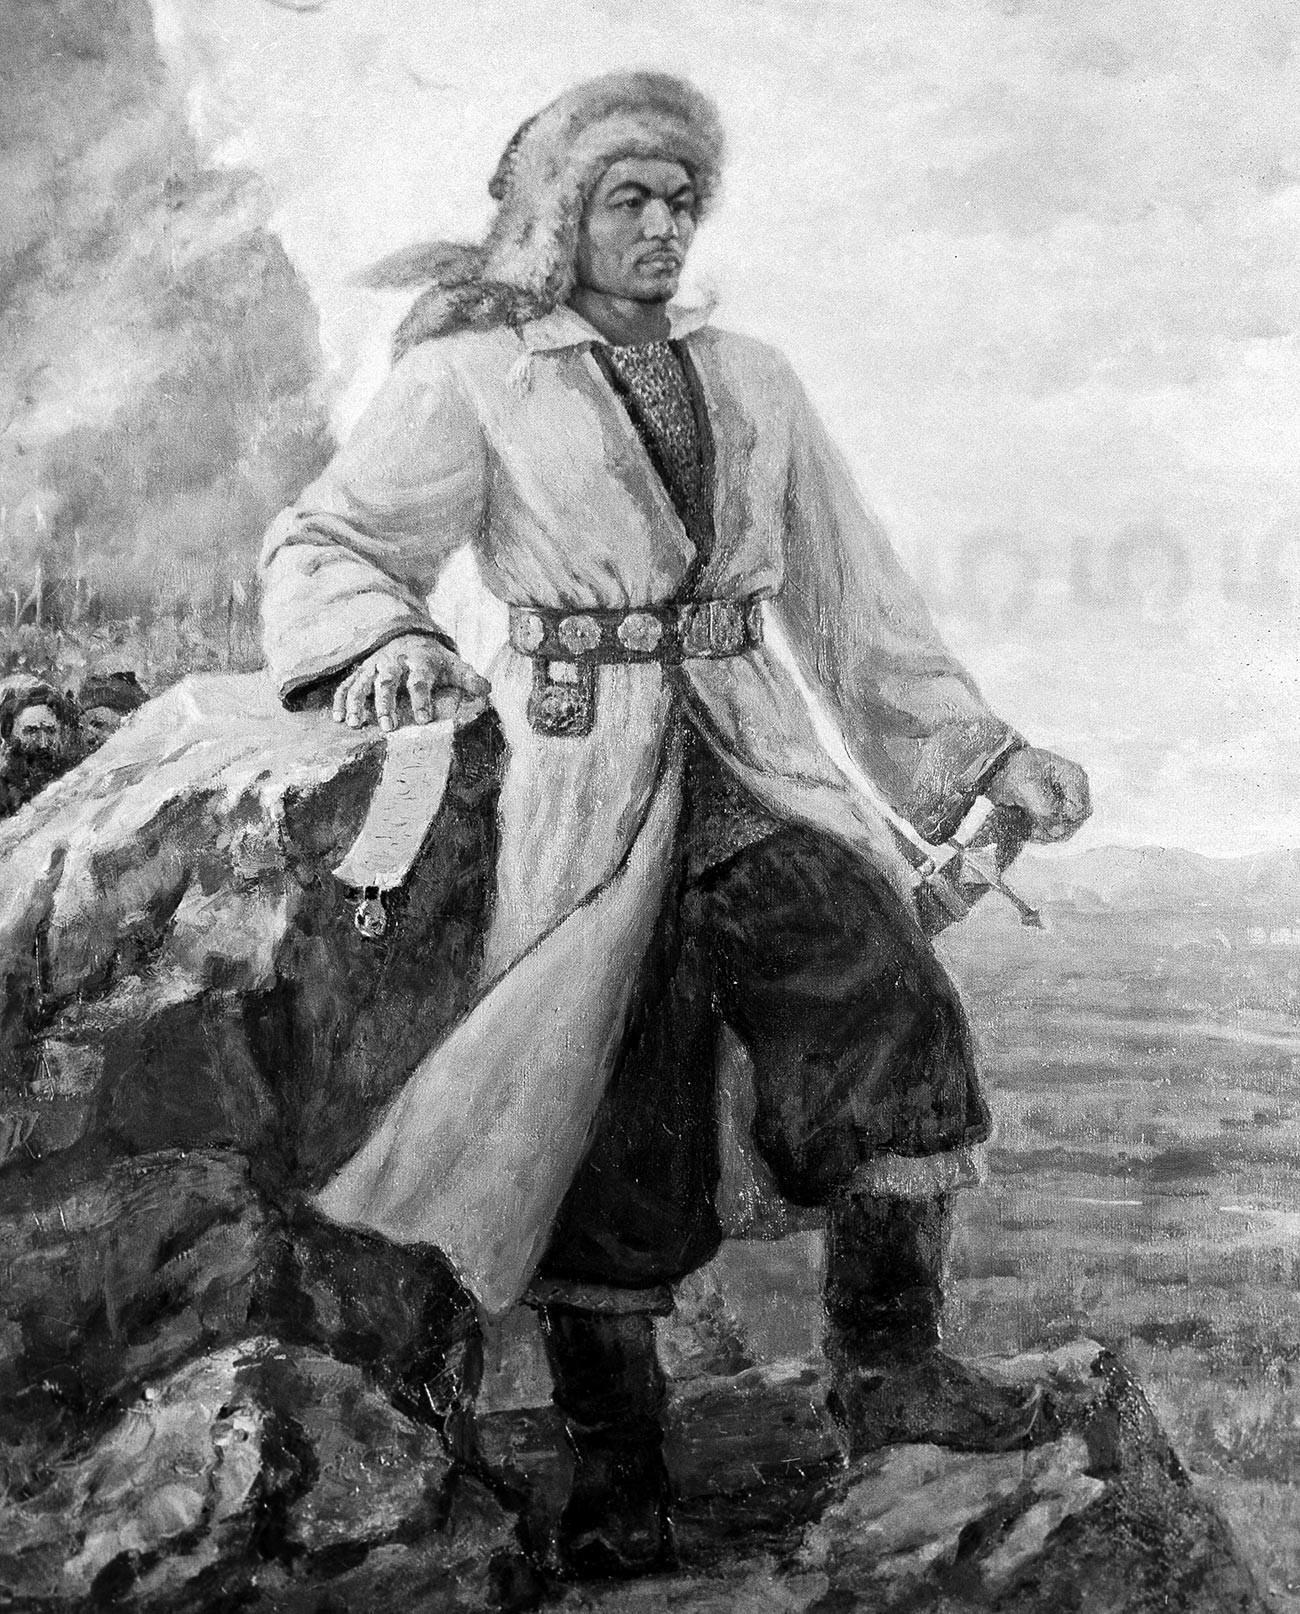 First ever portrait of Salavat Yulayev in Bashkir art, drawn by Gabdulla Mustafin in 1957. Reproduction